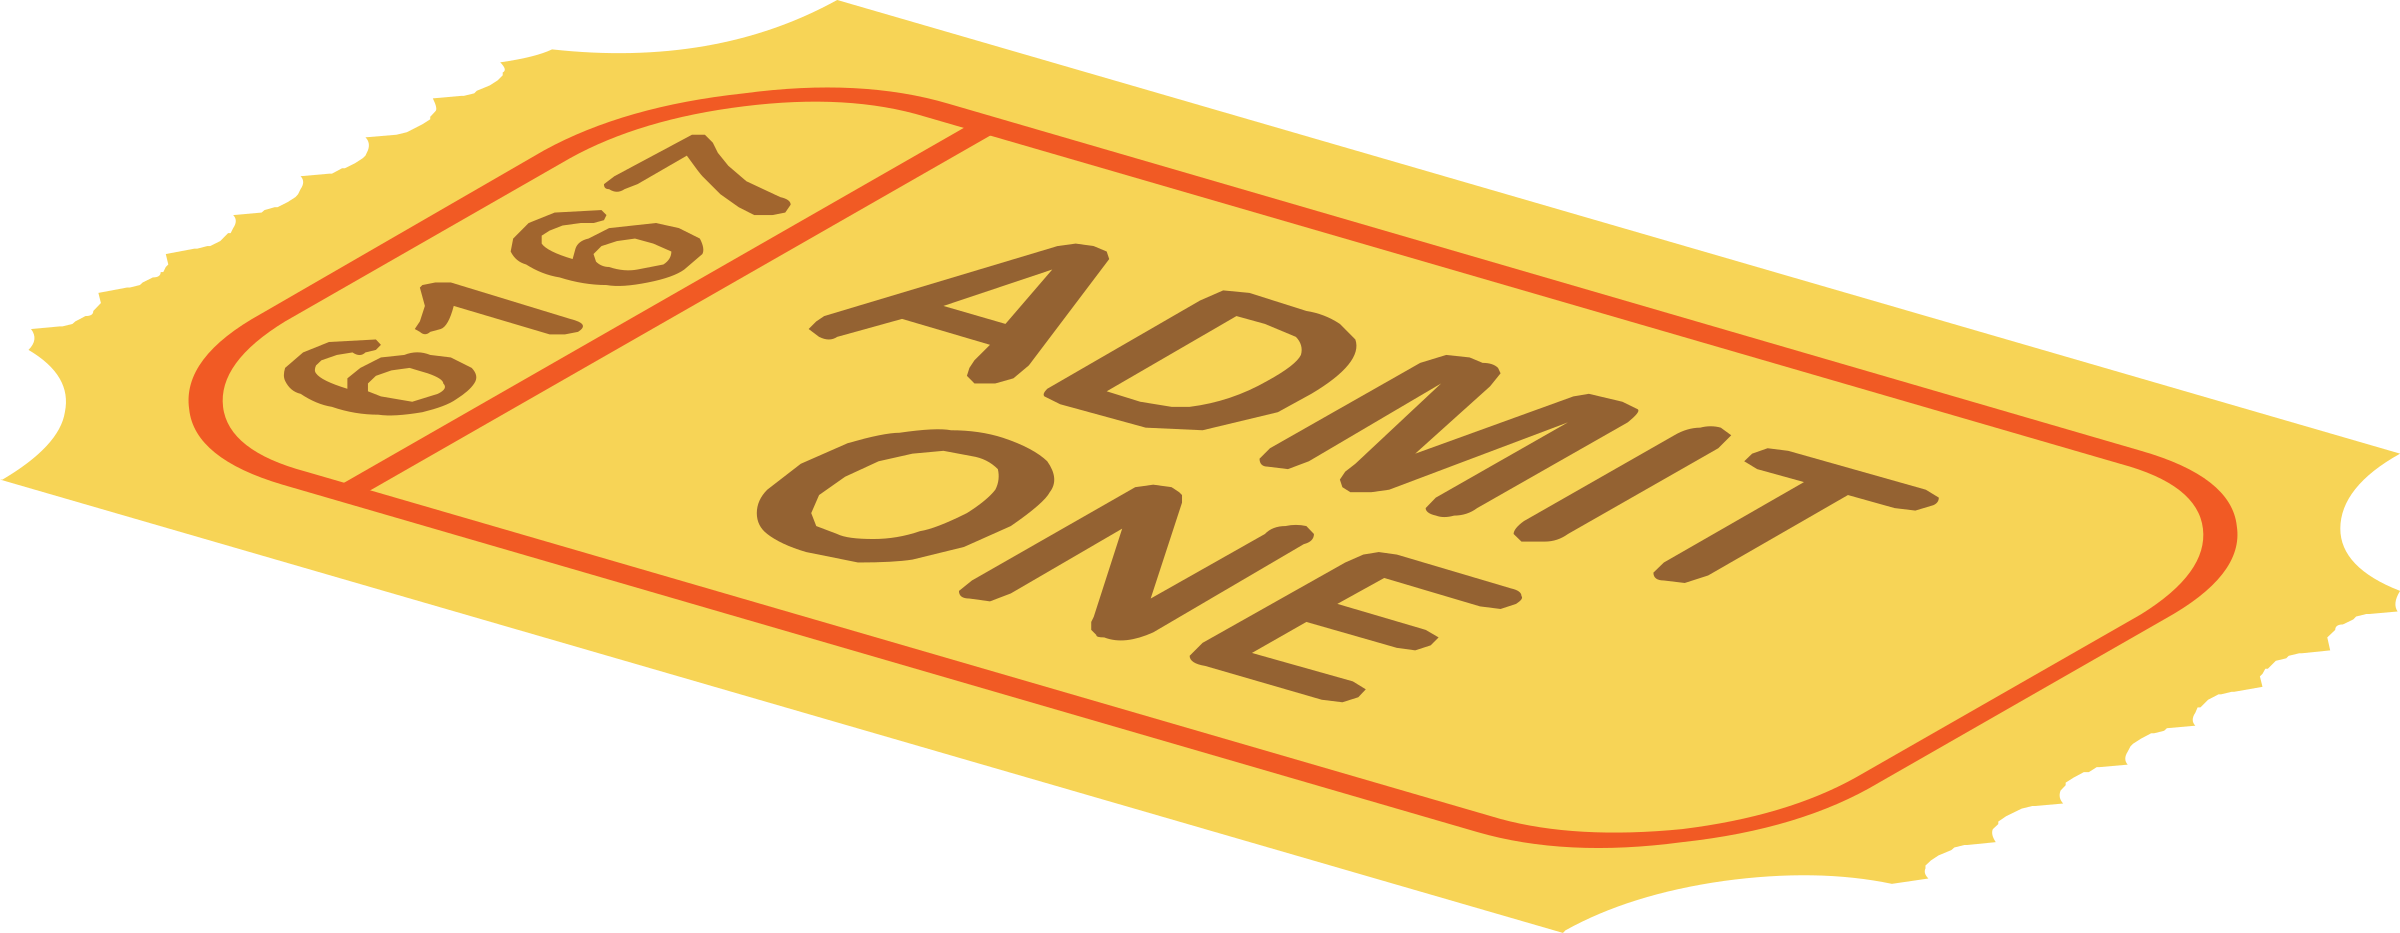 Misc gameshow big image. Ticket clipart yellow